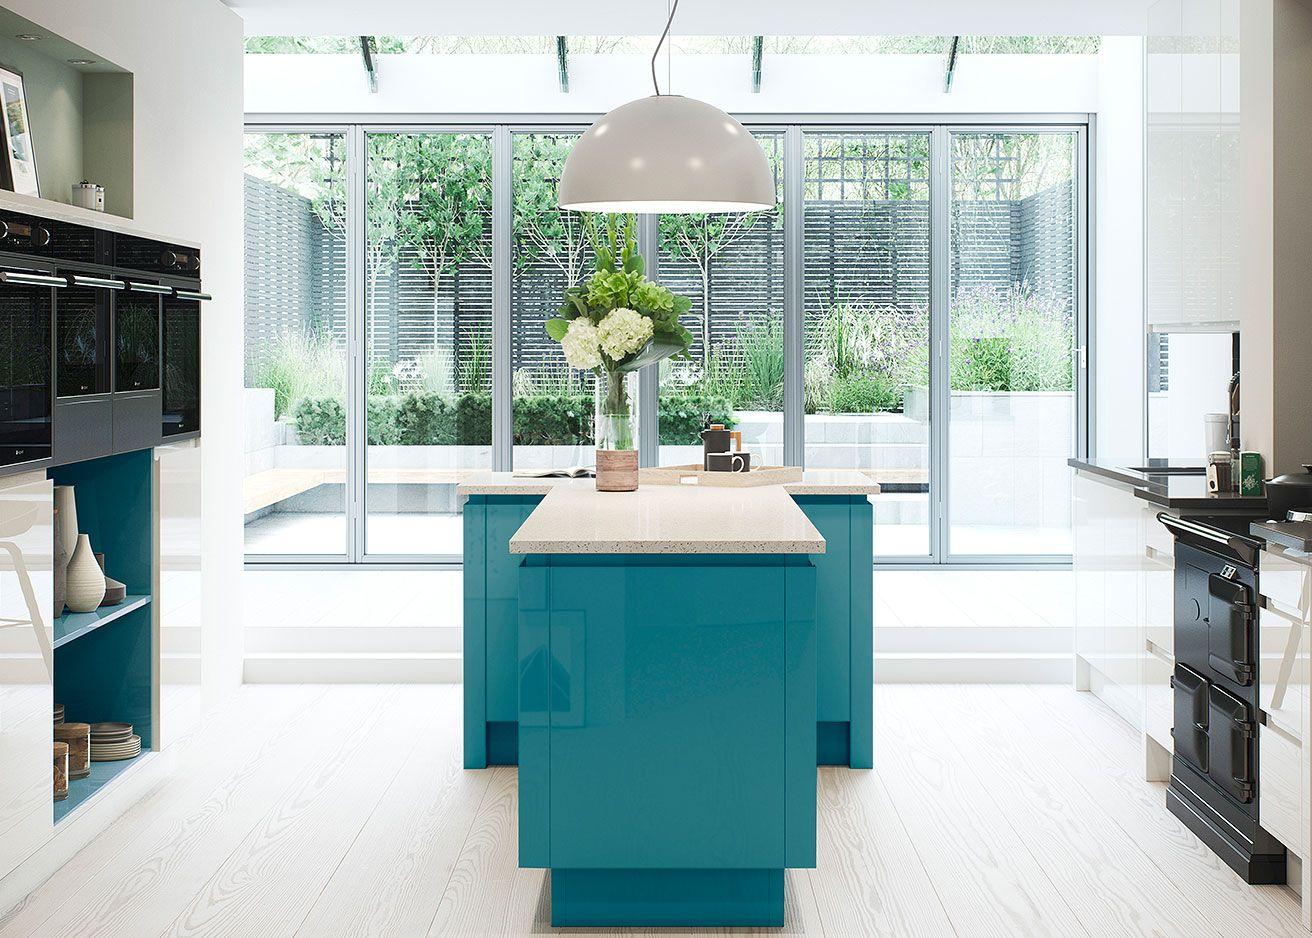 Welford Gloss | Bespoke, High gloss and High gloss paint